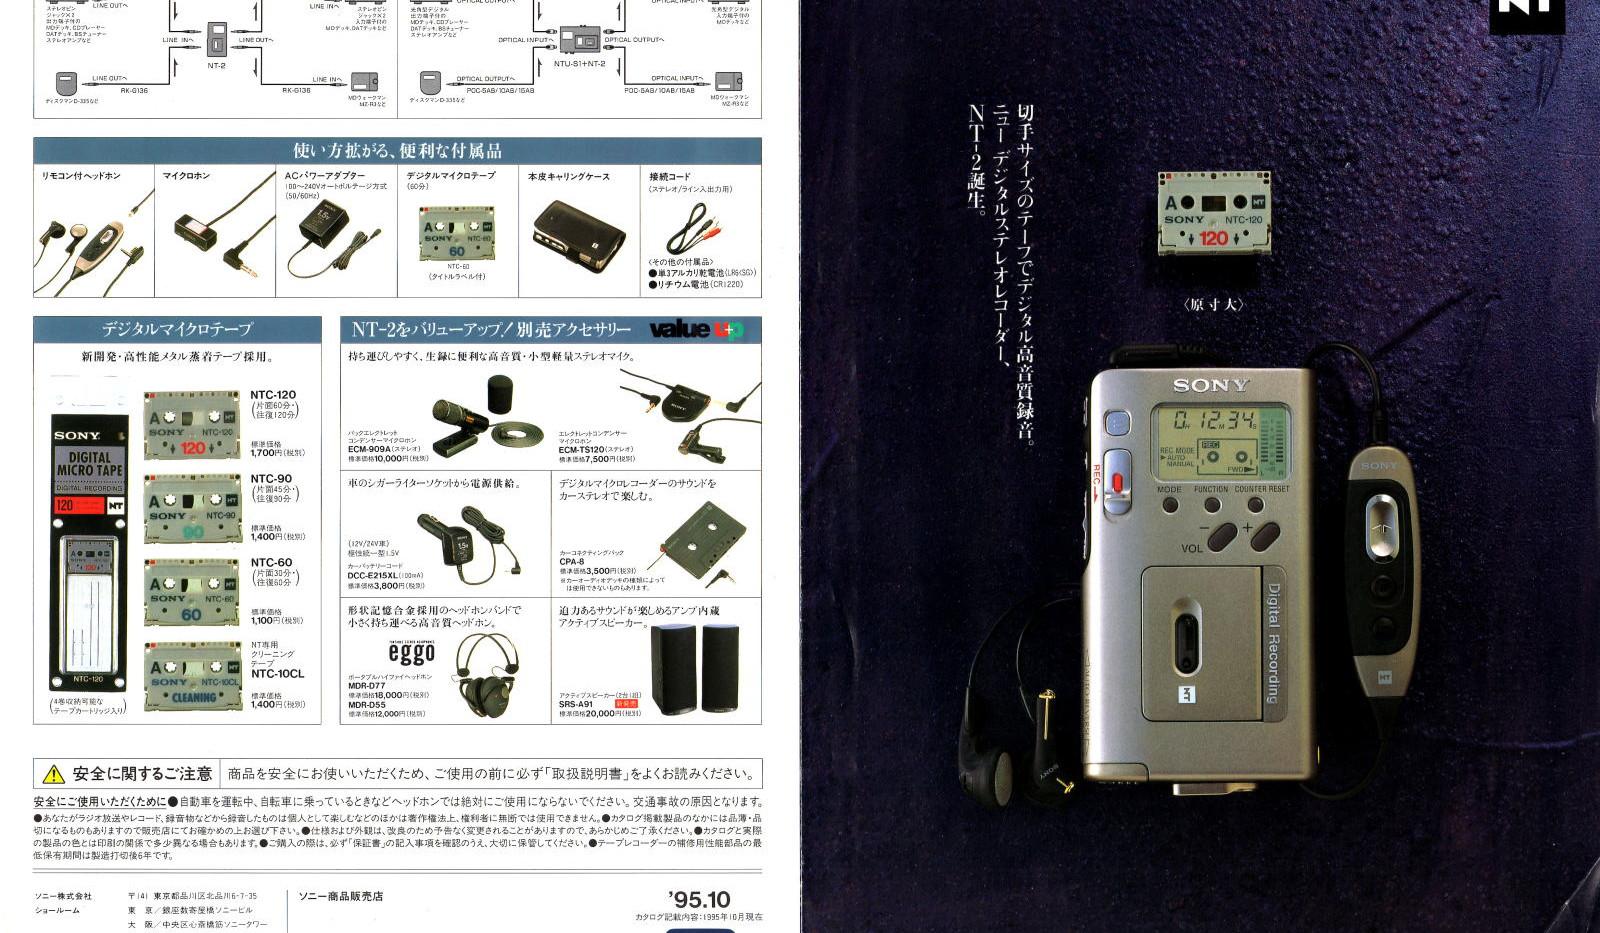 19951.10-NT-2-NTU-S1-AB.jpg